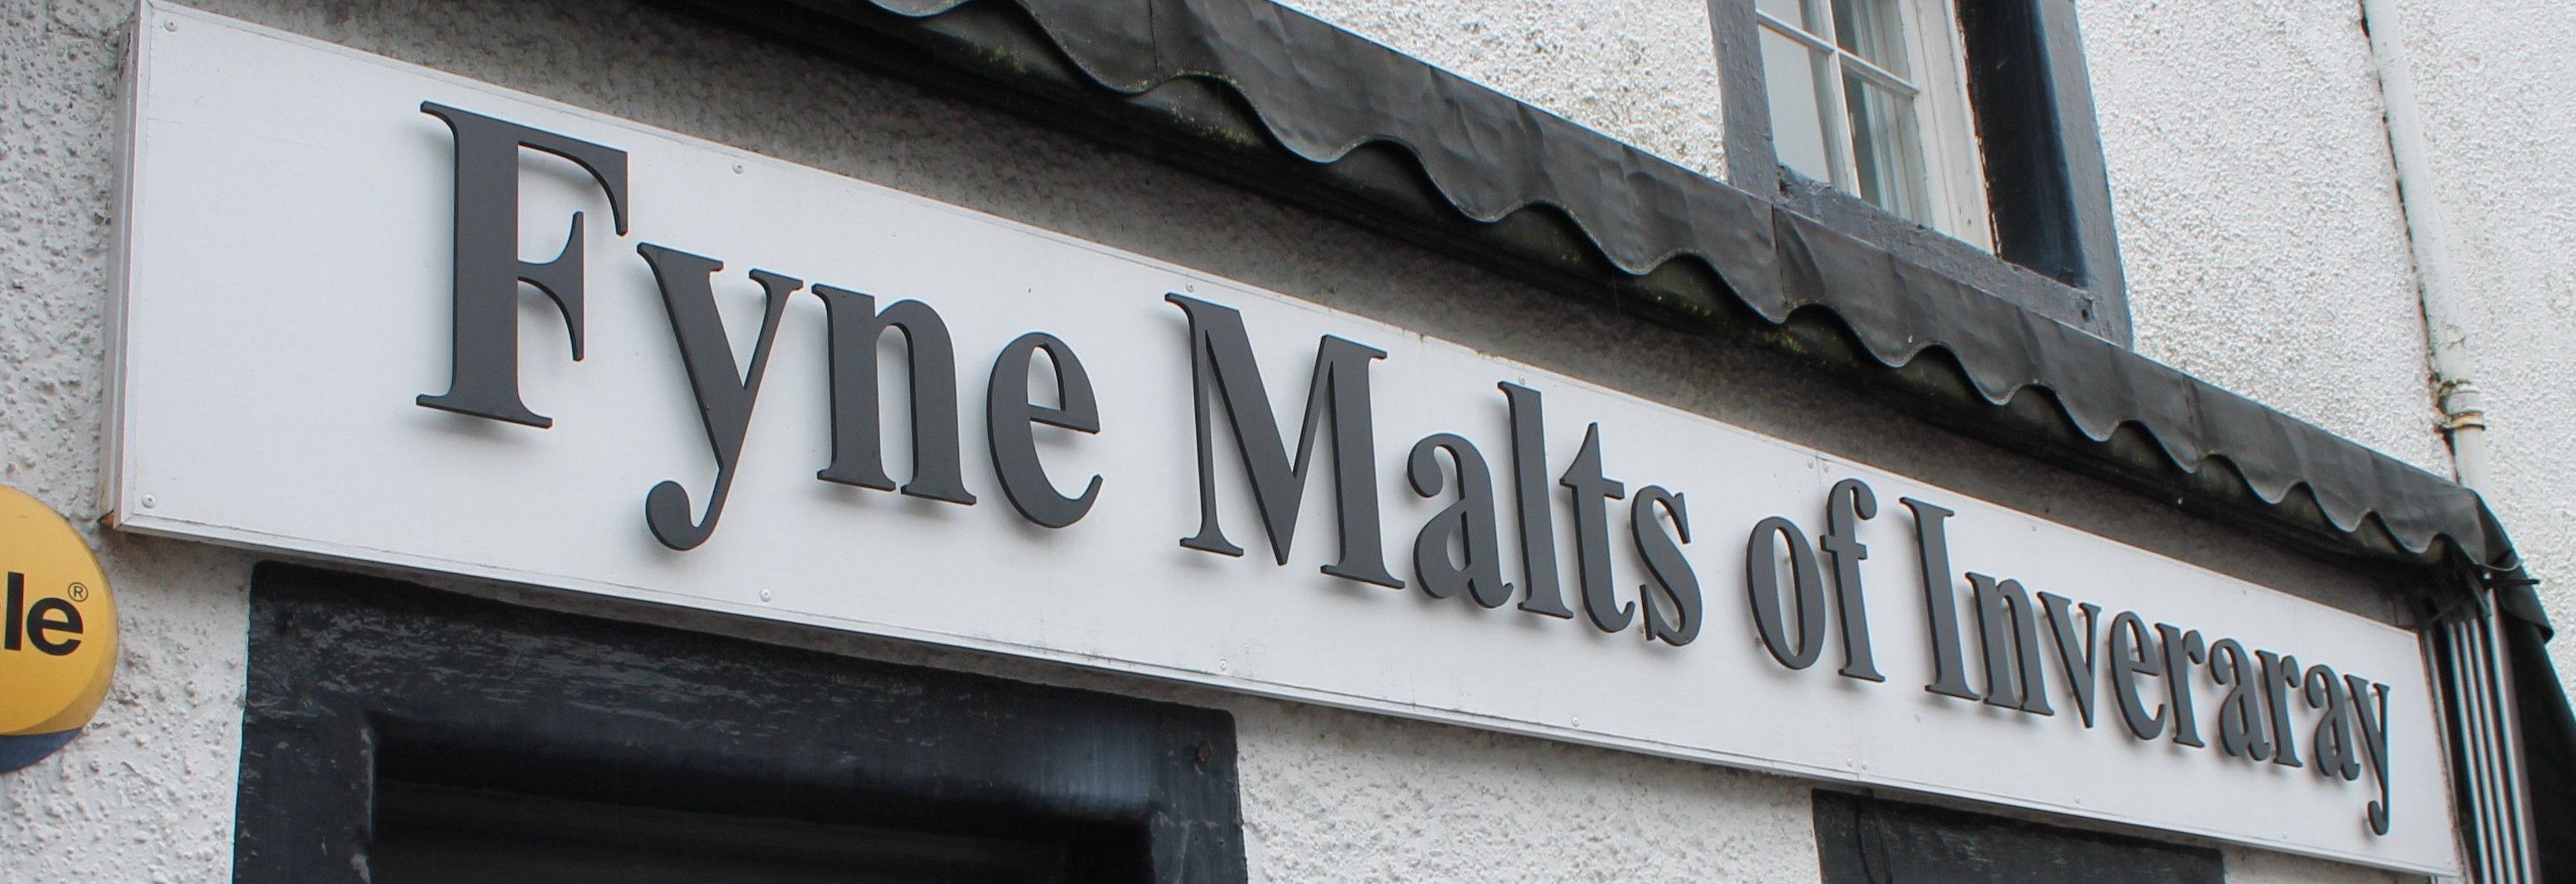 Fyne Malts of Inveraray